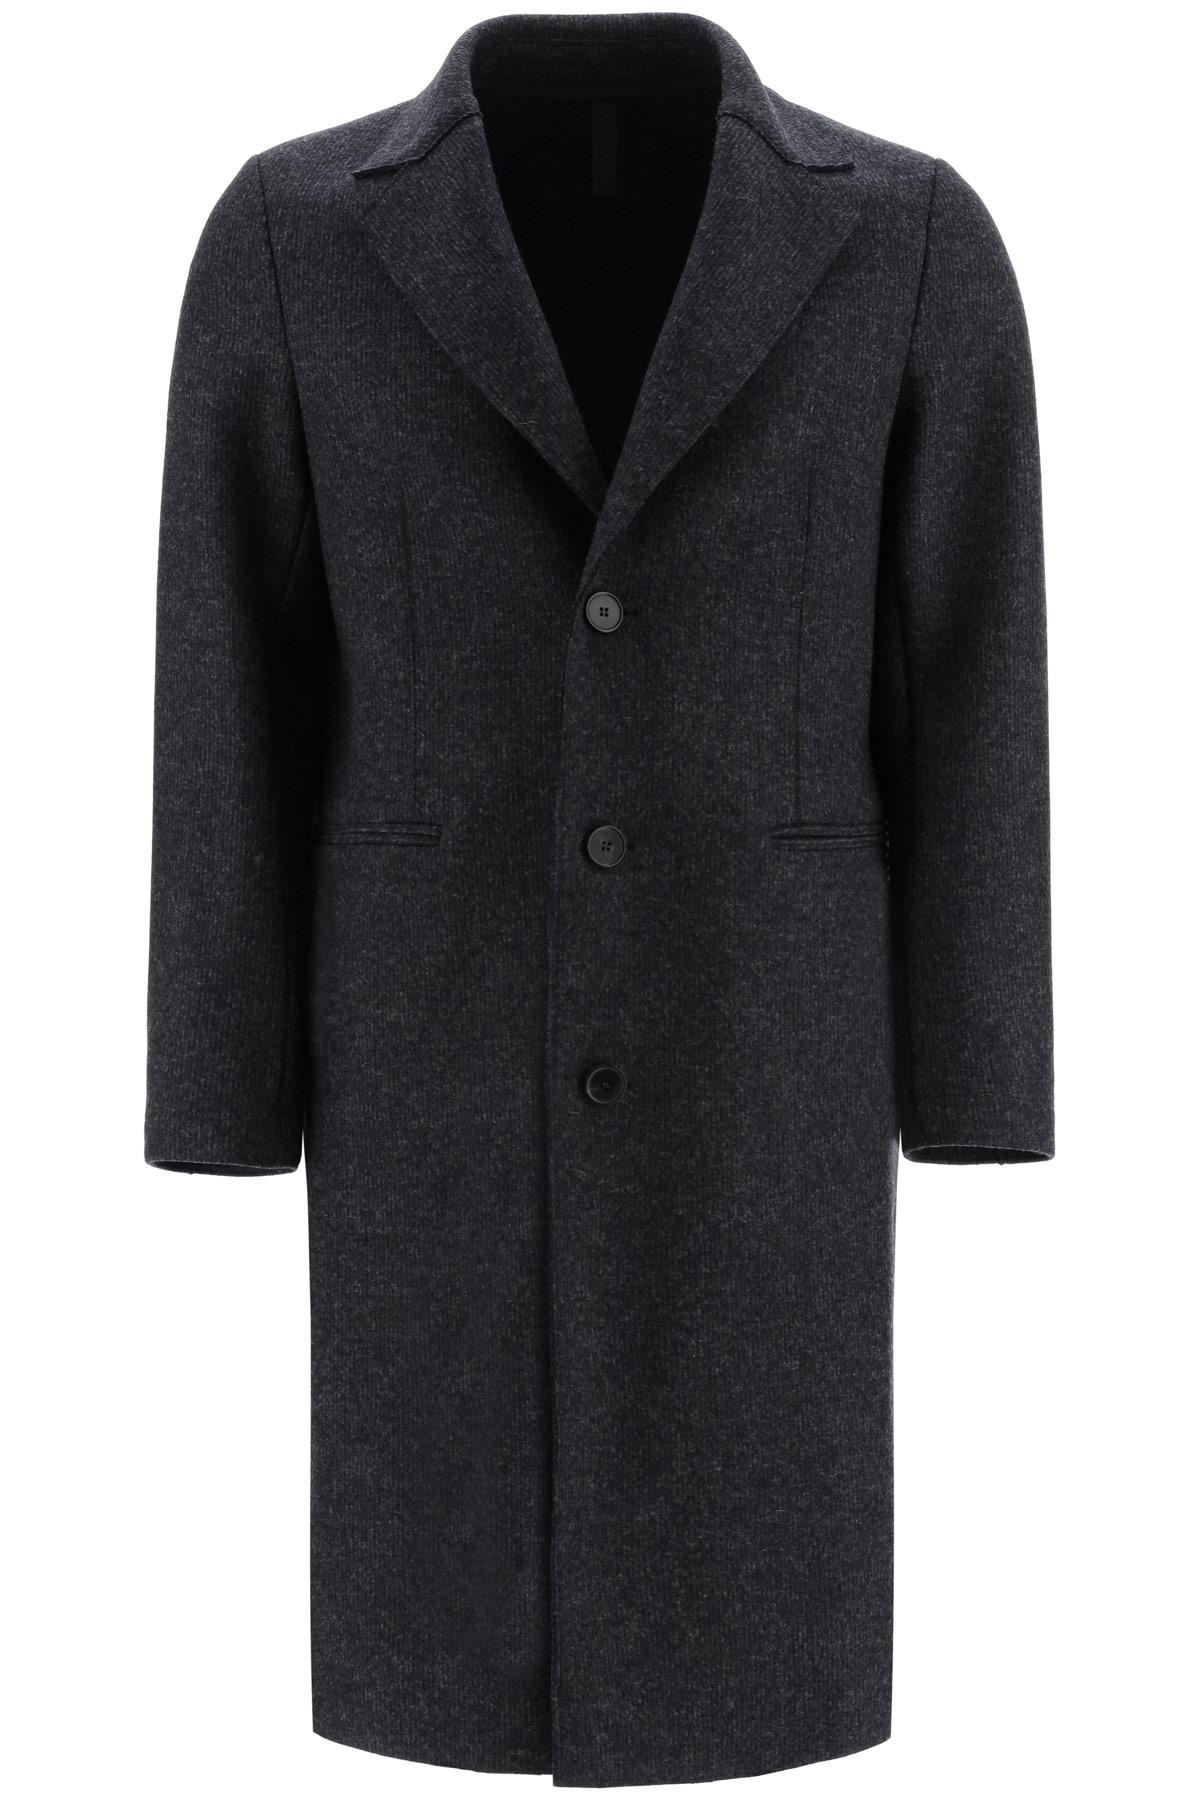 HARRIS WHARF LONDON REGULAR WOOL COAT 50 Grey Wool